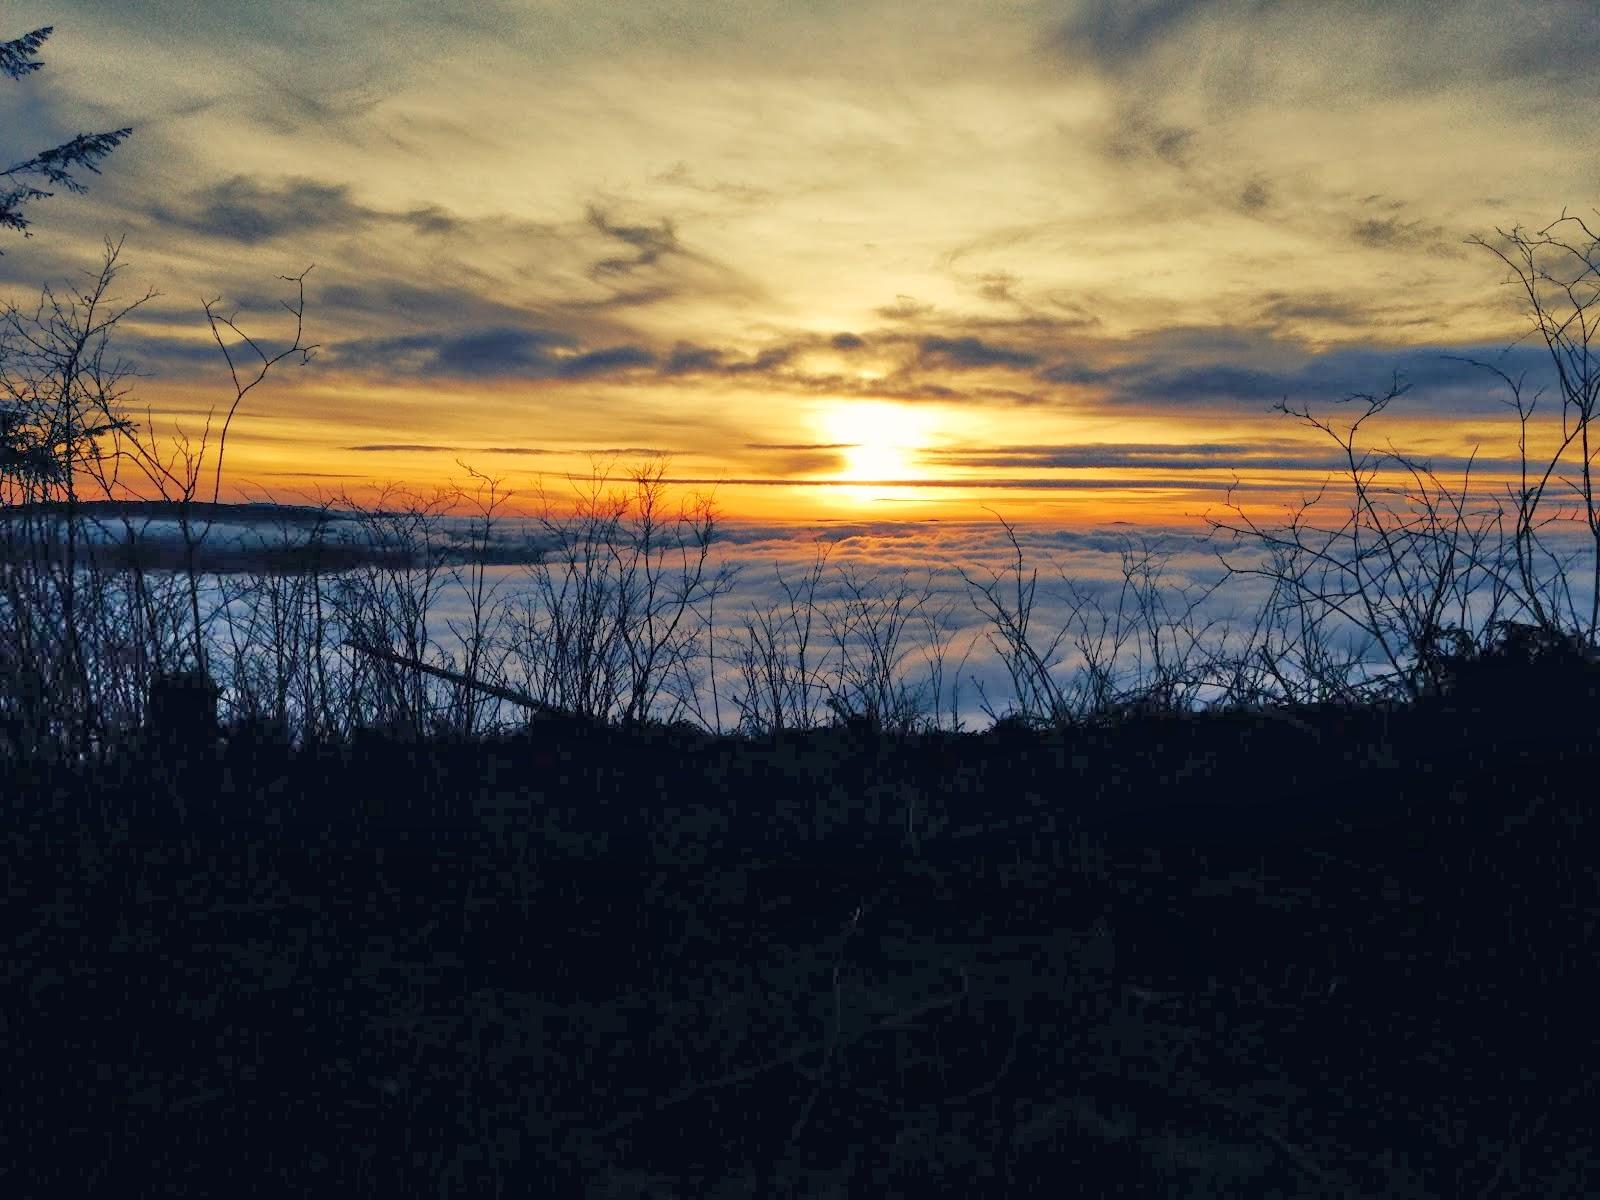 Minot Peak